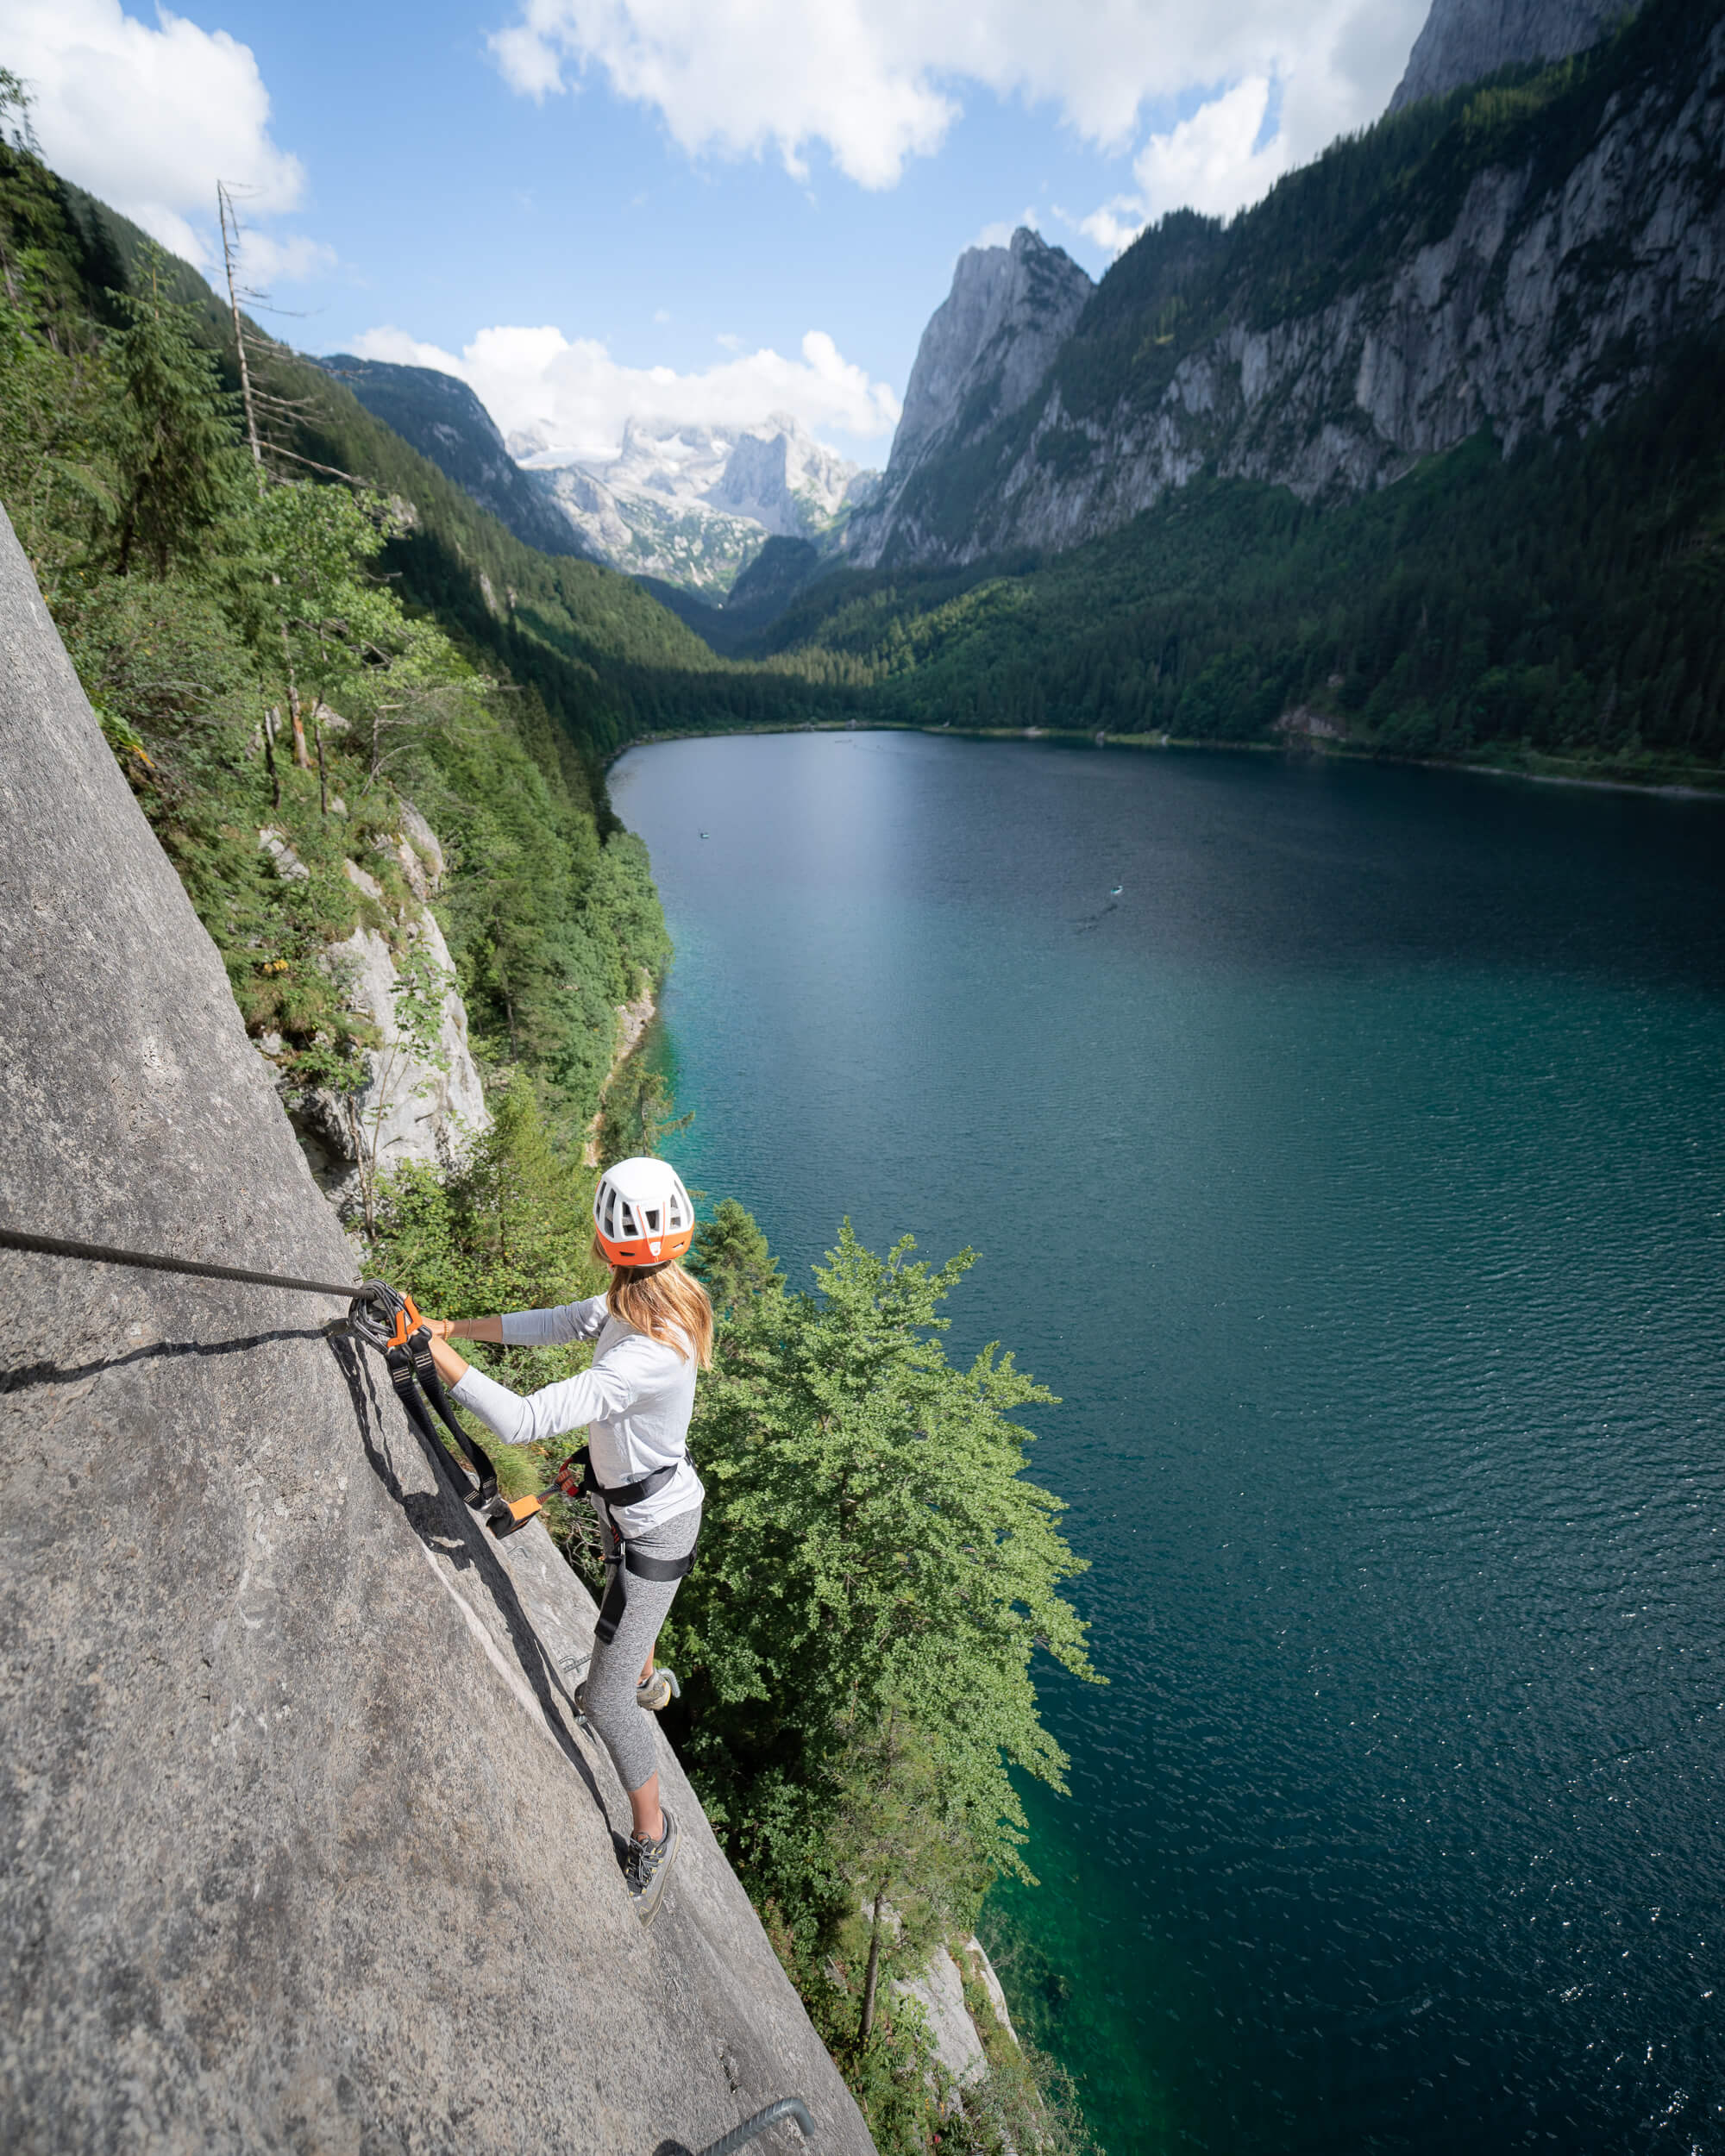 Climbing the Laserer via ferrata. Wearing:  shirt ,  leggings ,  trail running shoes ,  helmet .